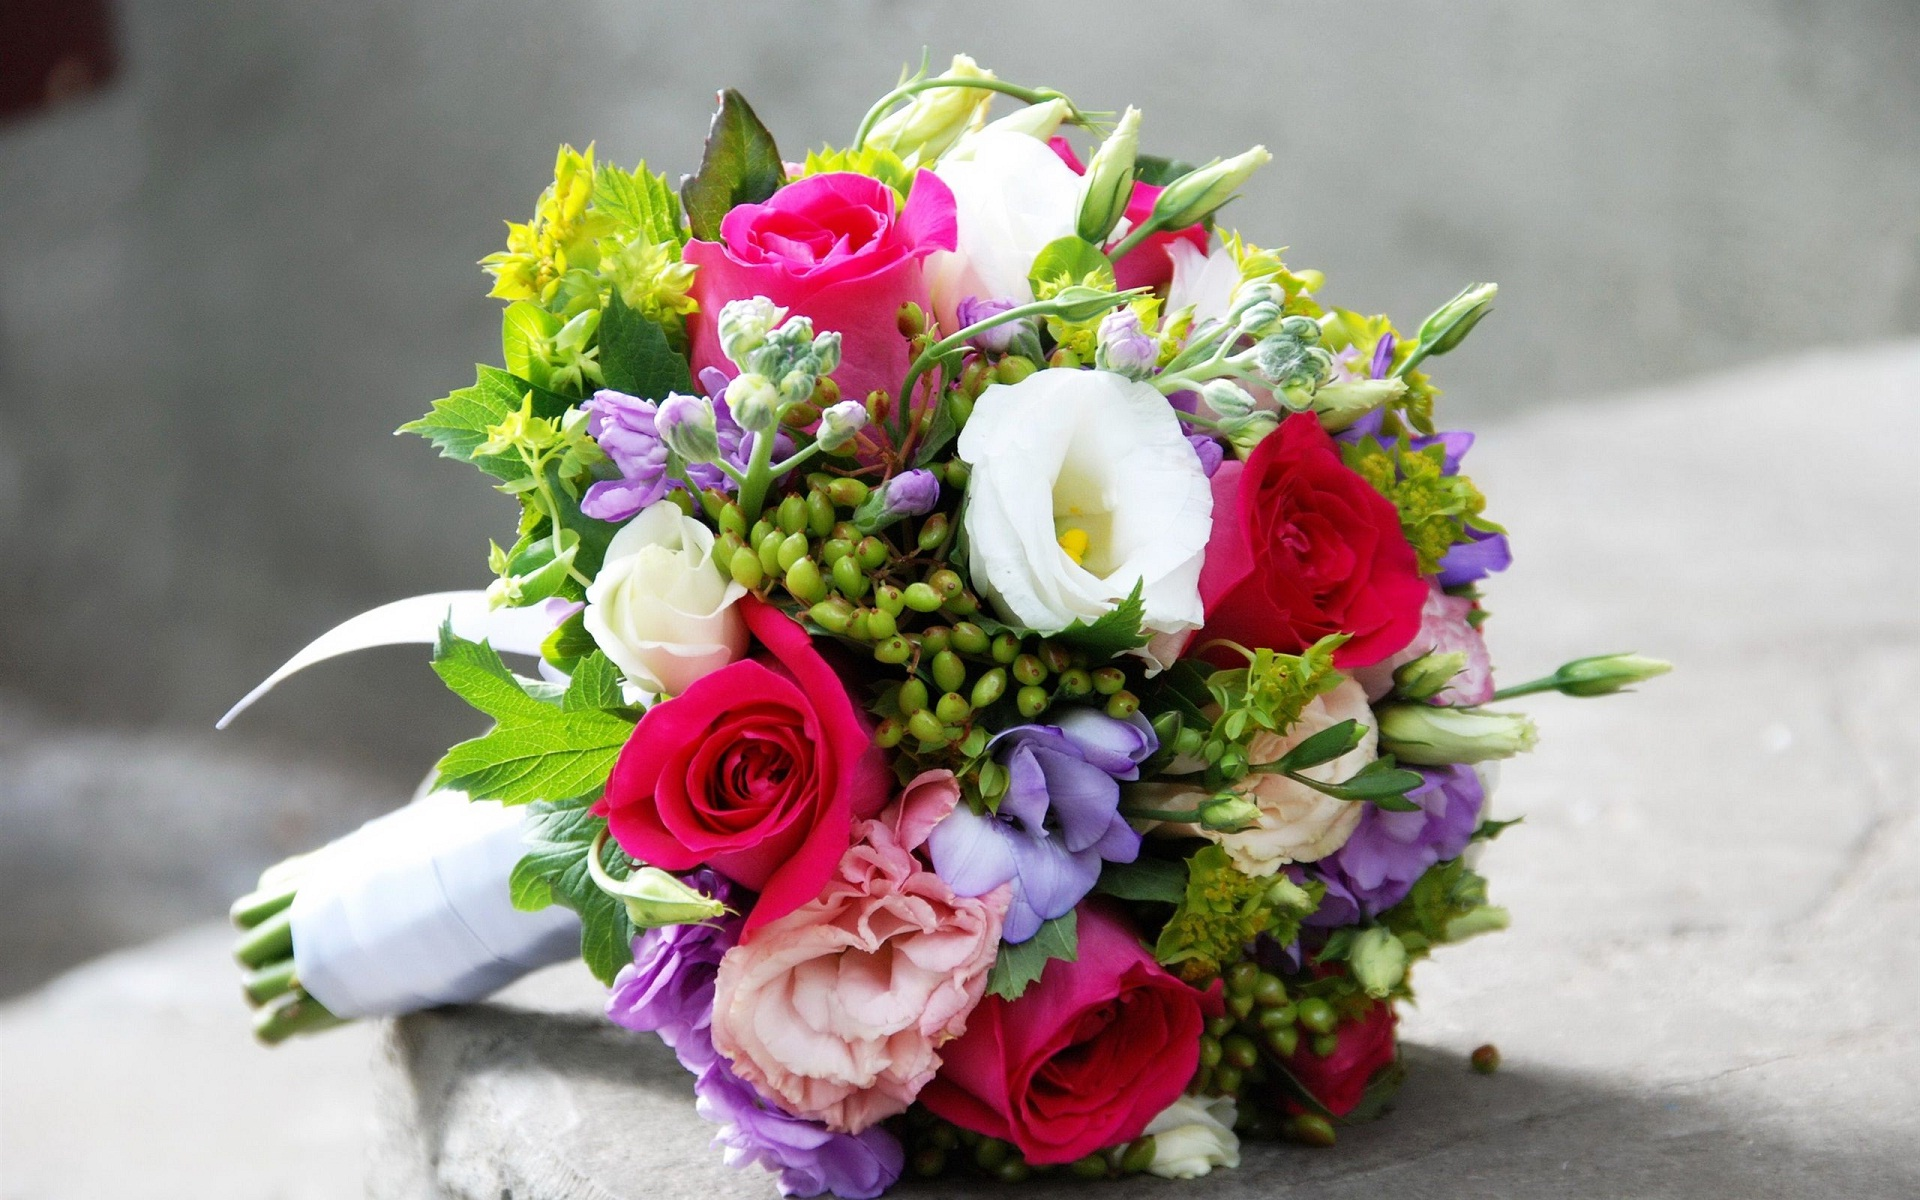 Beautiful Flowers Bunch Hd Wallpaper Hd Wallpapers Bunch Of Flowers Hd 2881788 Hd Wallpaper Backgrounds Download